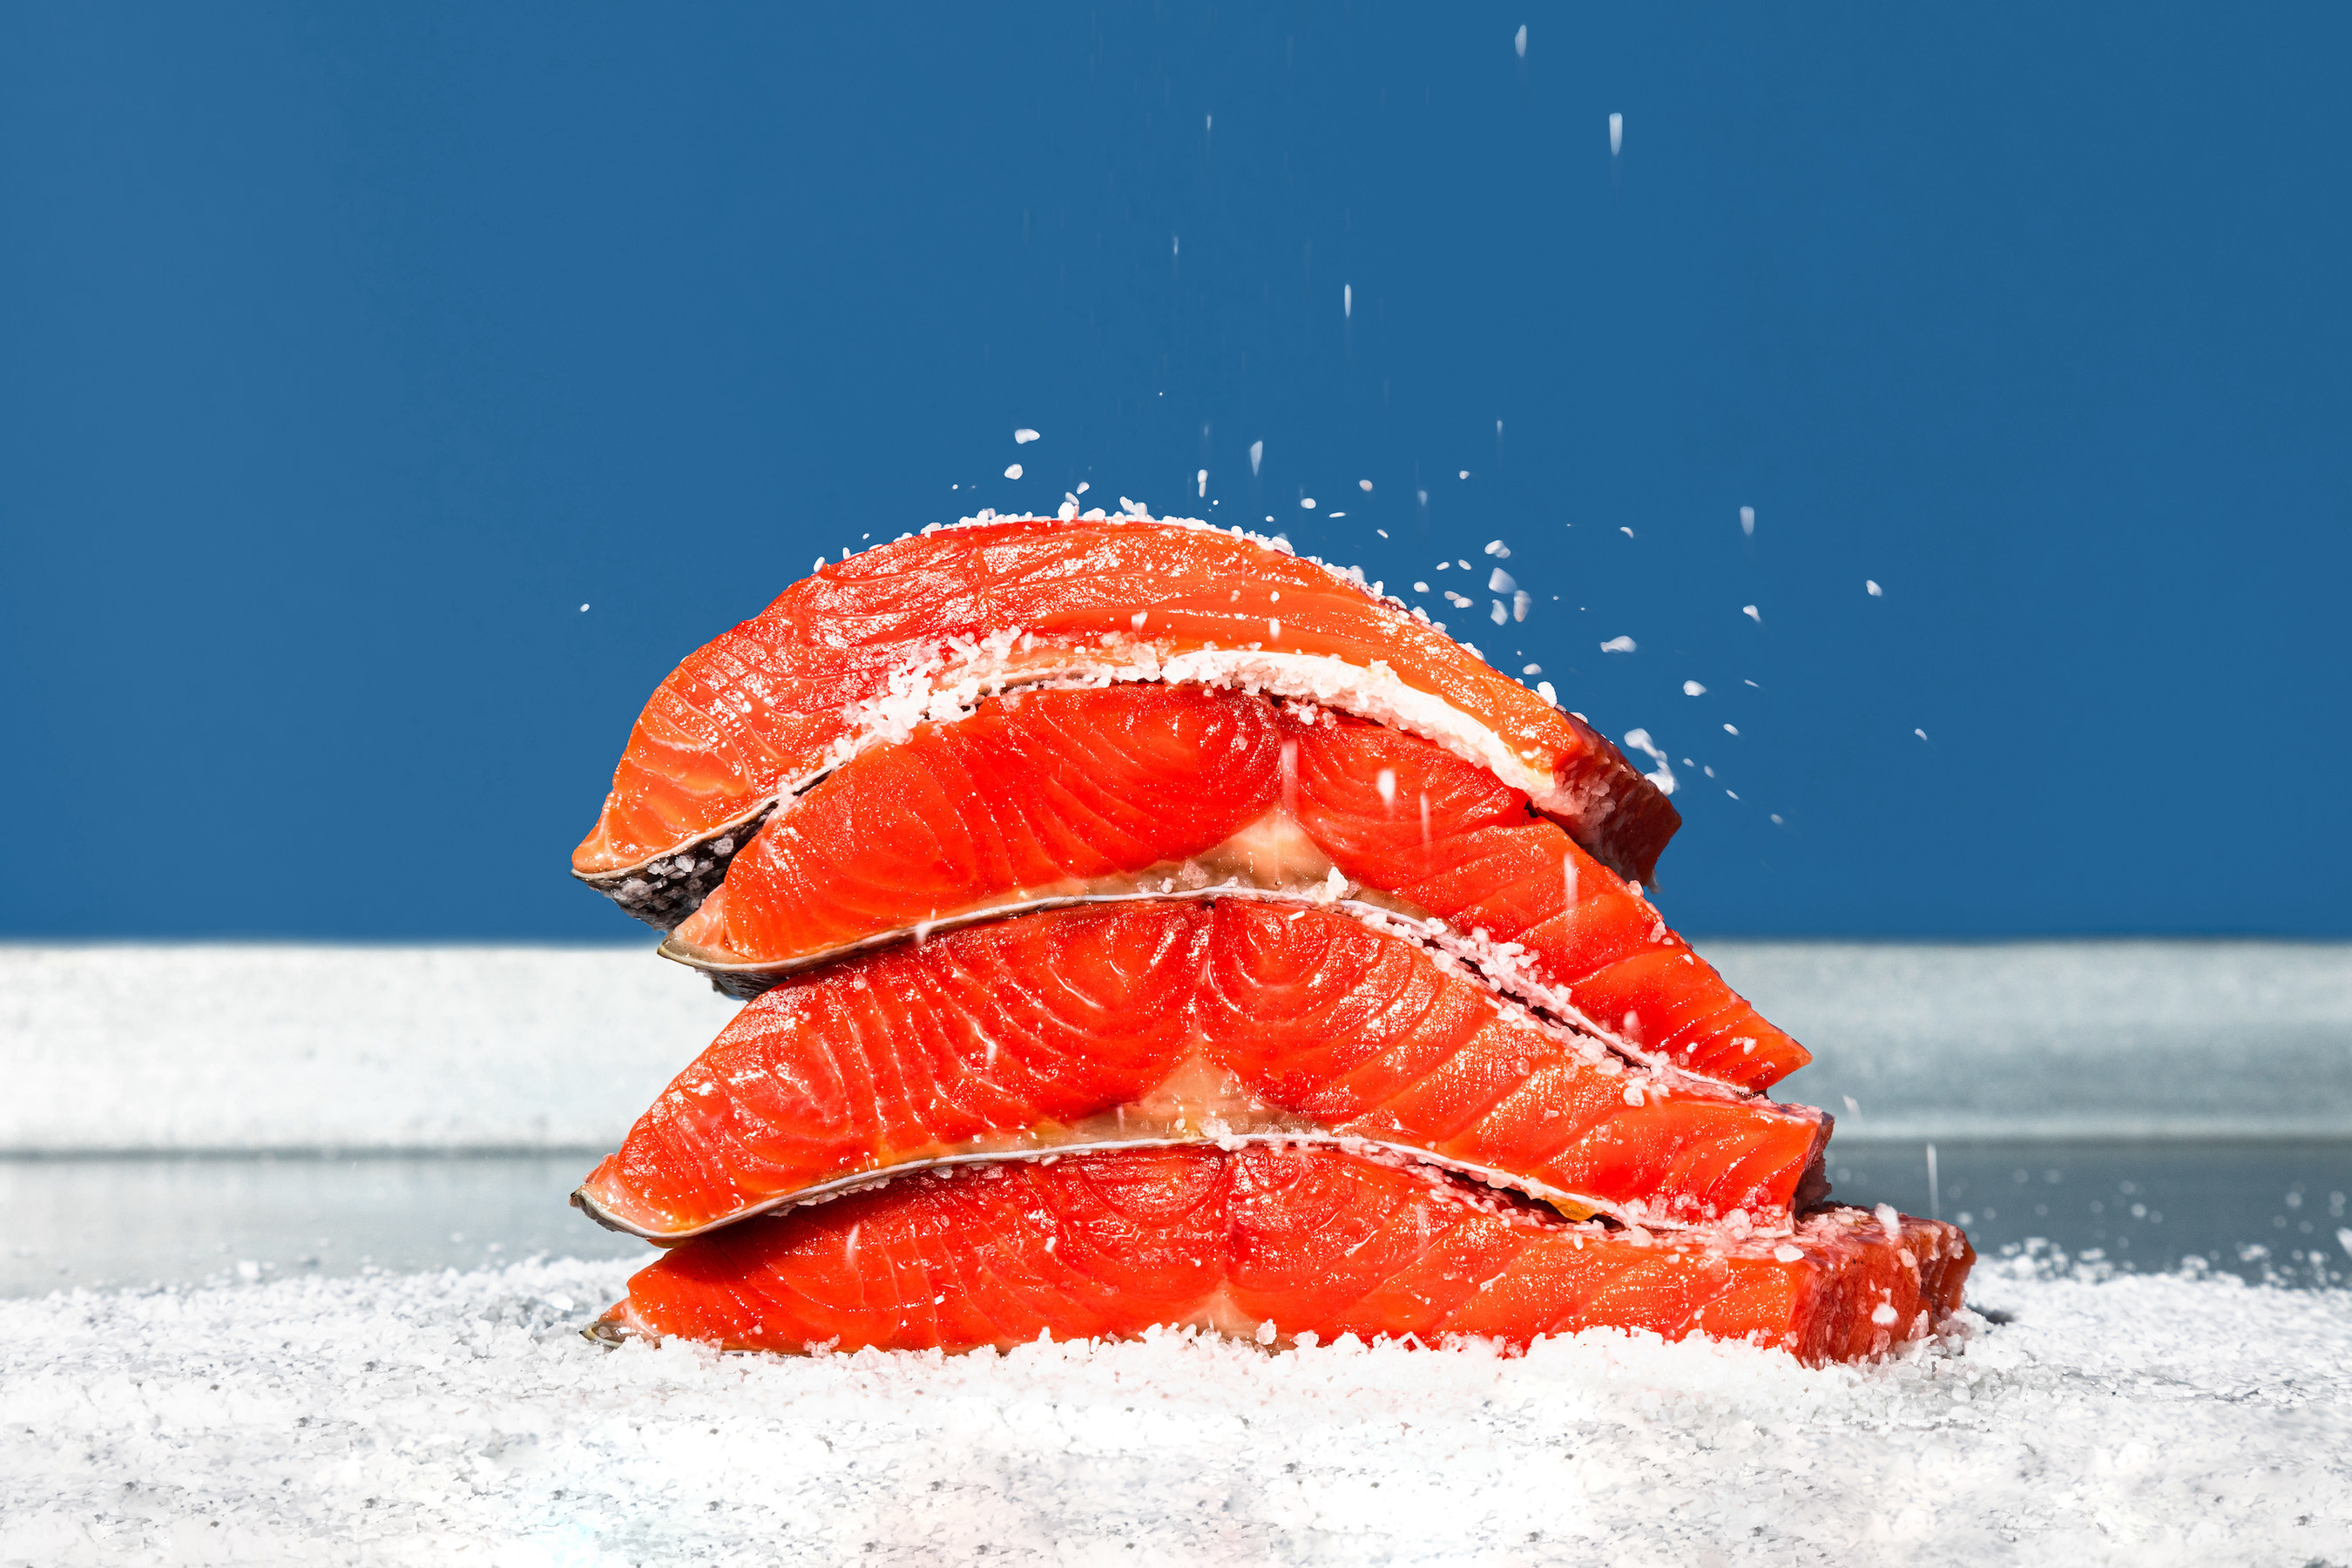 Fishermen-owned Alaskan Salmon Providing Direct-to-Consumer Access to Copper River King Salmon